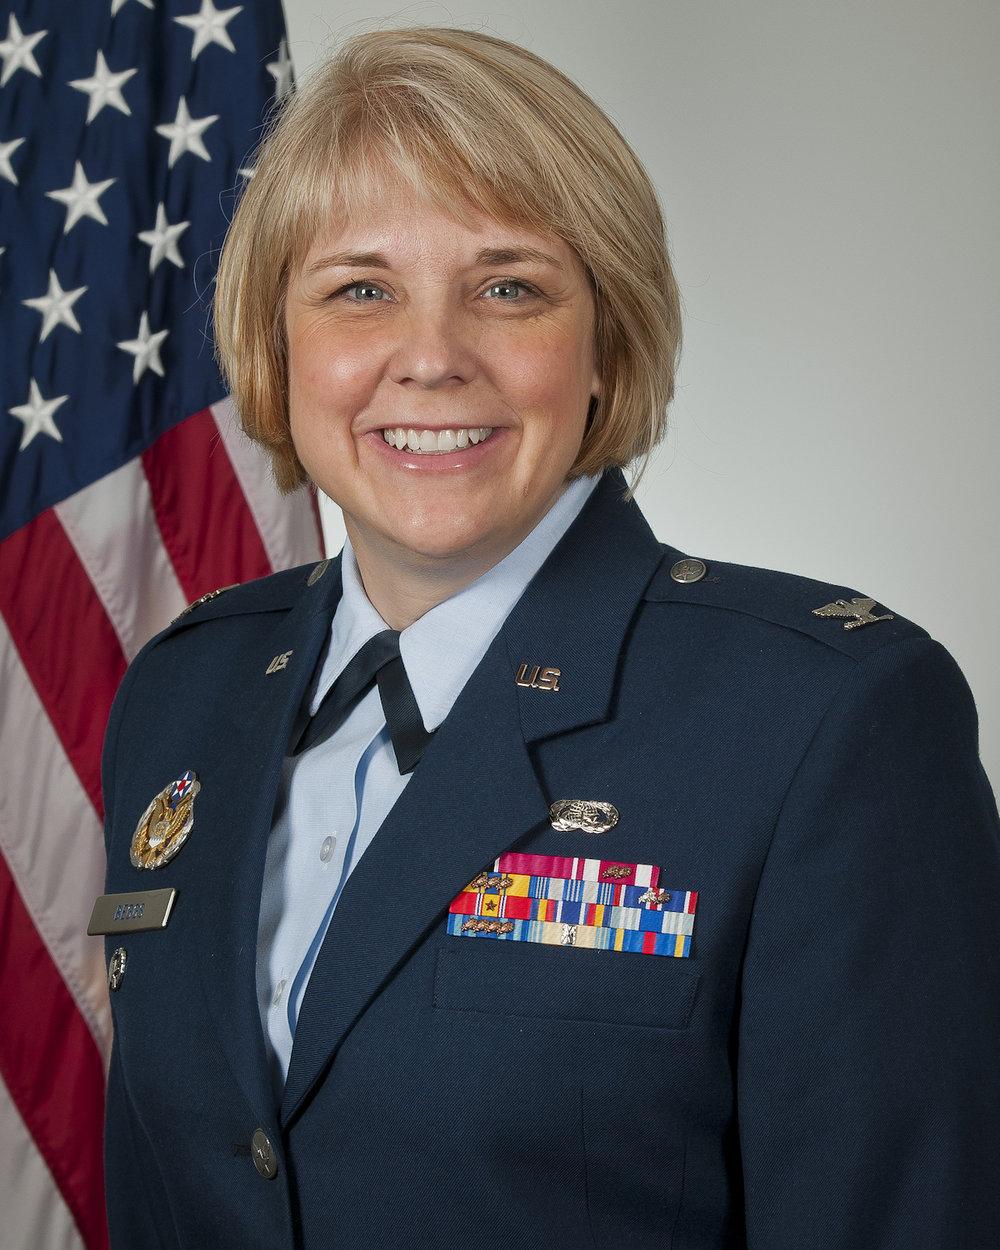 Malinda Begs '86 Col. U.S. Air Force